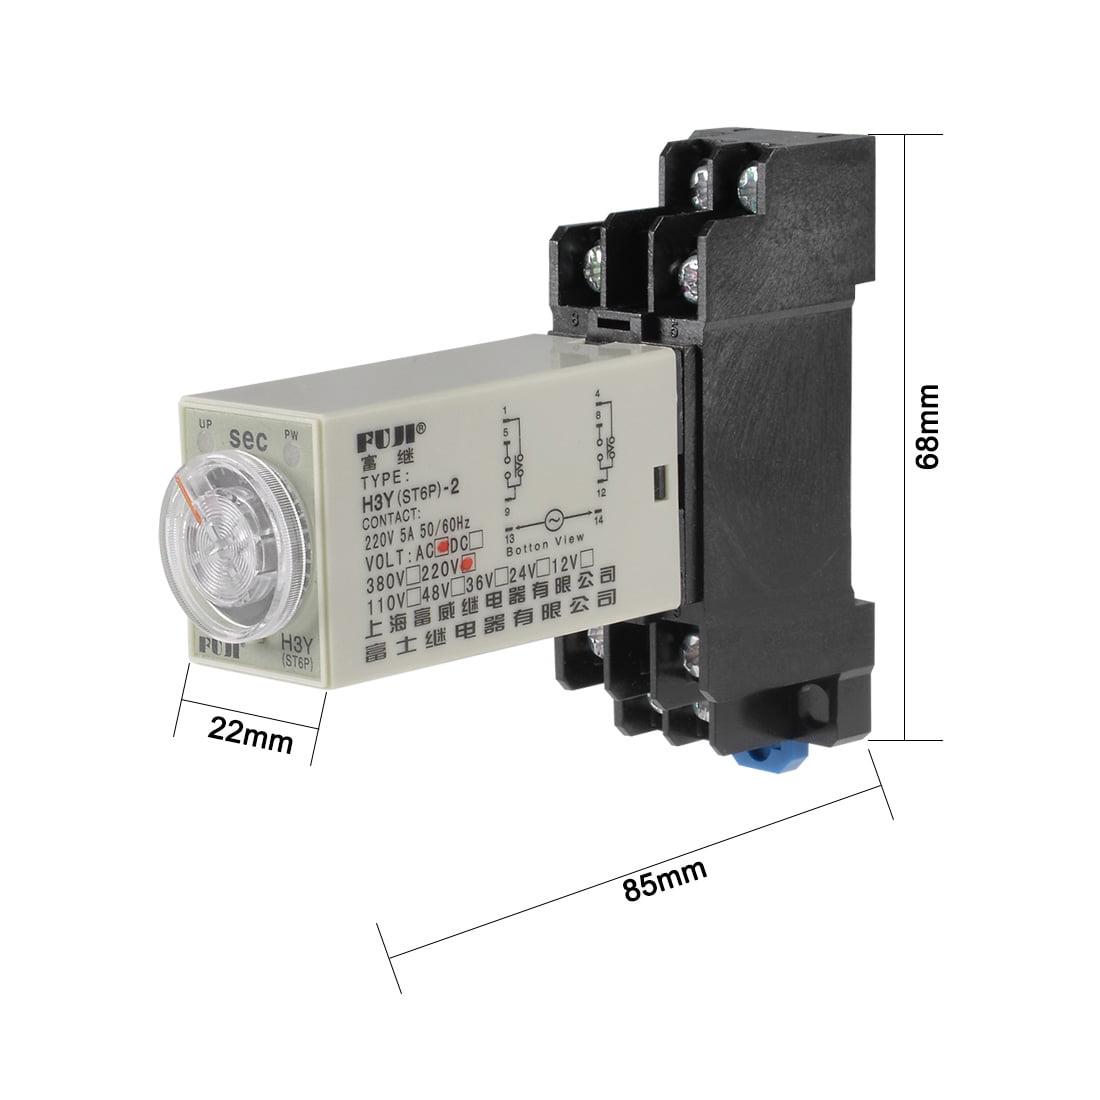 220VAC 60S 8 Terminals Range Adjustable Delay Timer Time Relay H3Y-2 w base - image 3 of 6